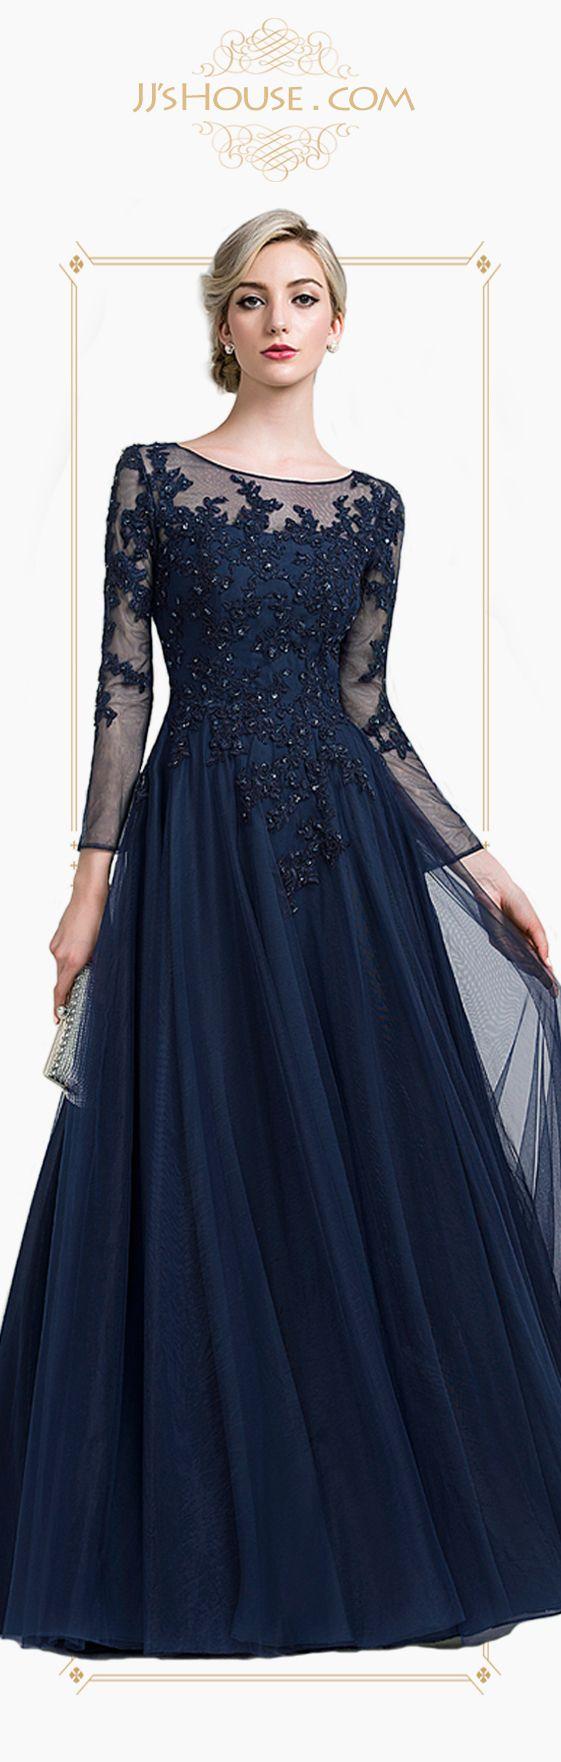 Wedding dress shops in deira dubai   best Black Dress images on Pinterest  Evening gowns Party